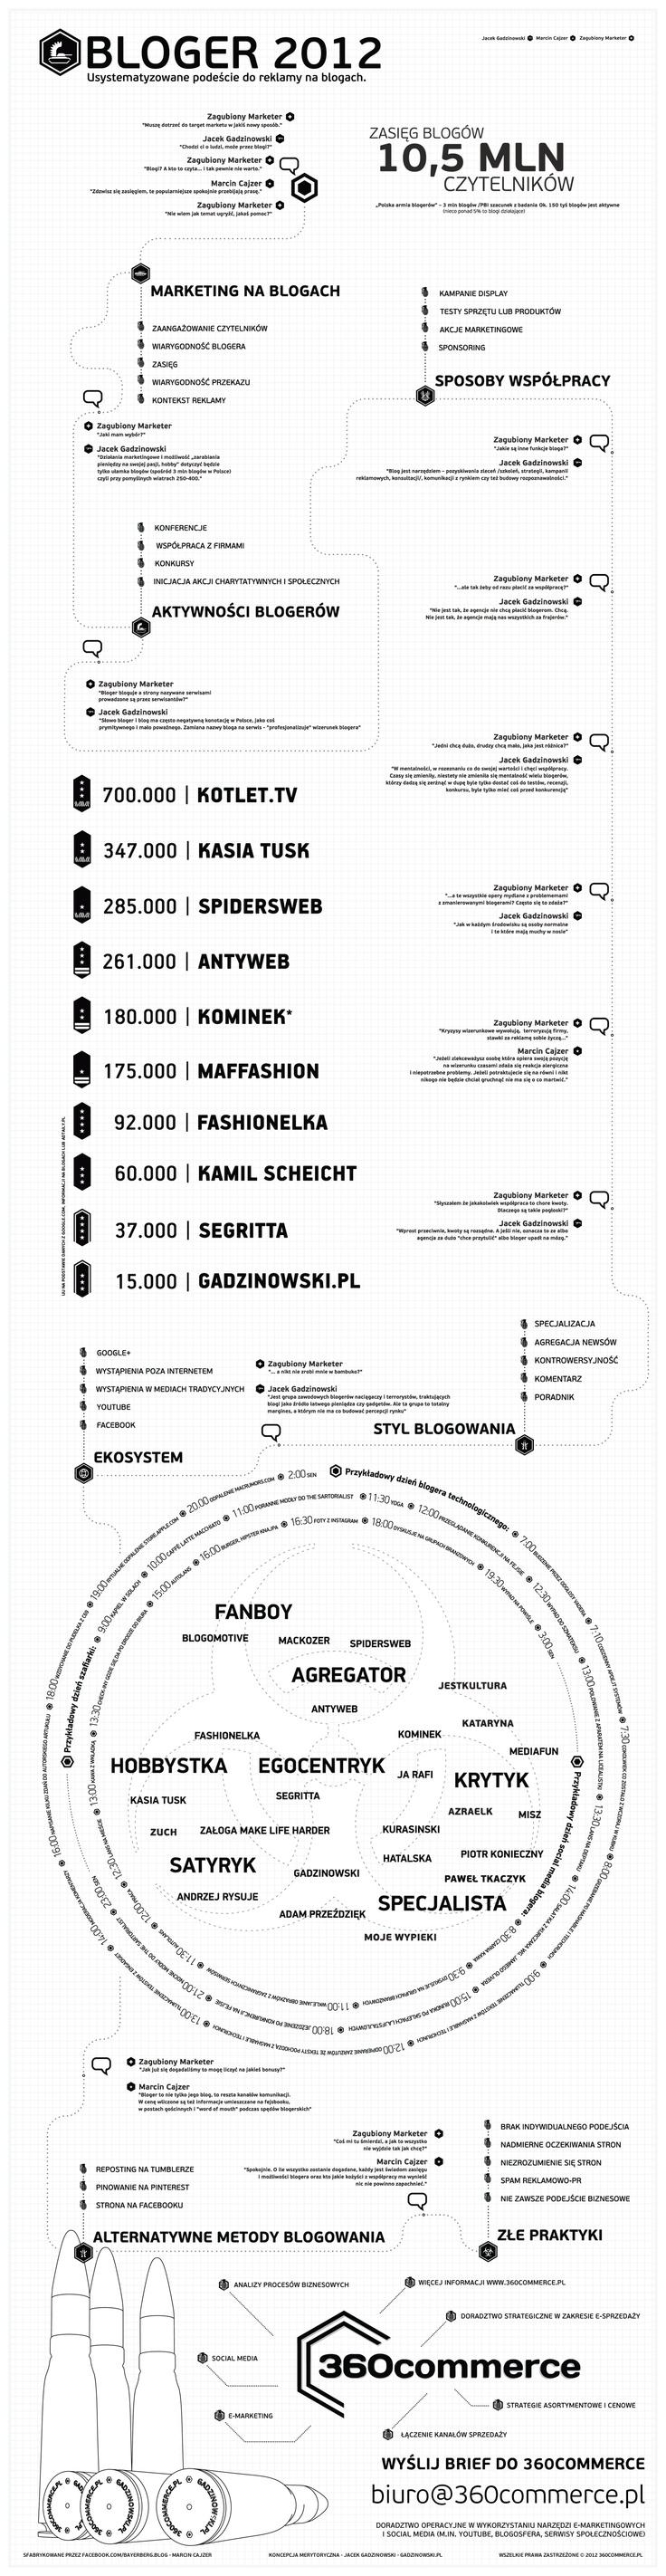 infografika blogi 2012